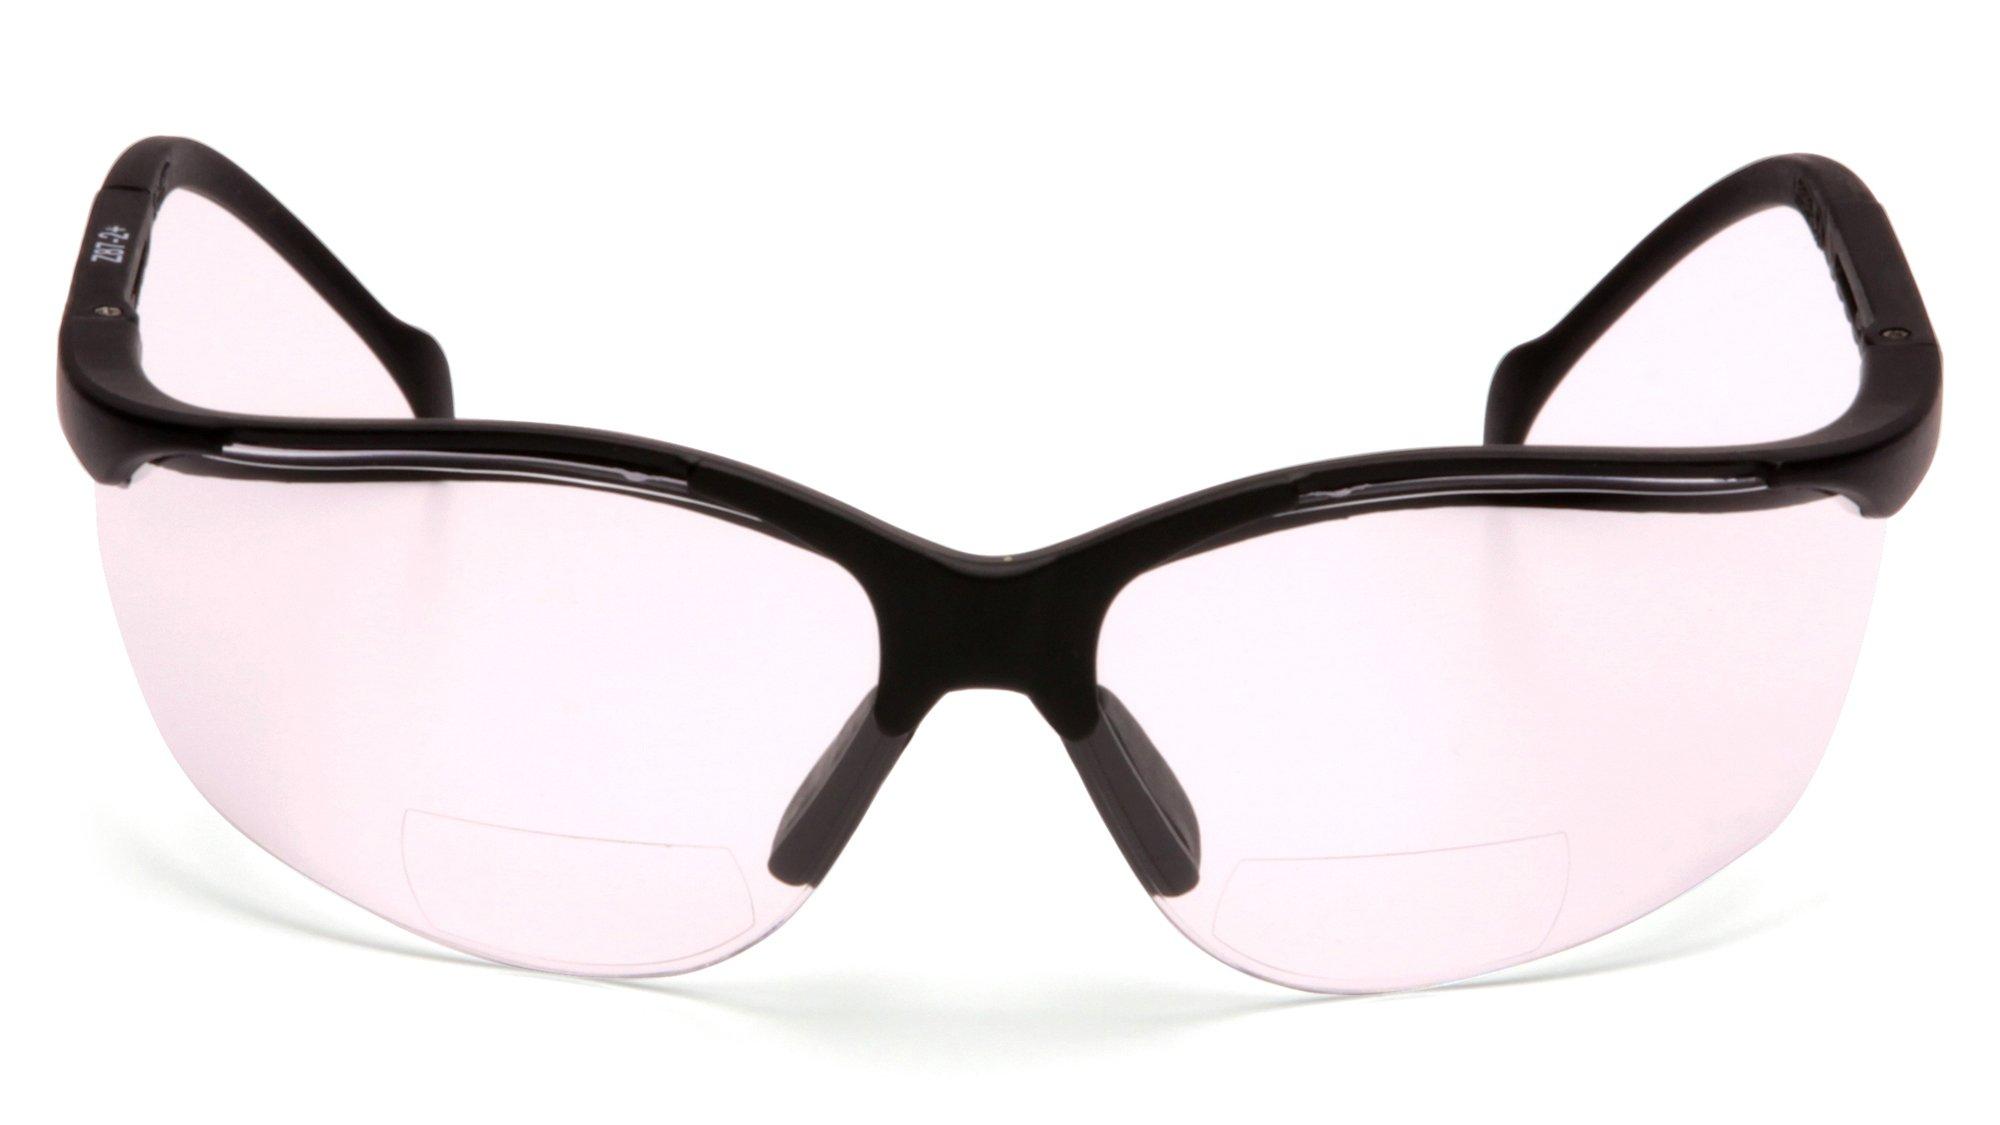 Pyramex SB1810R20T Venture II Readers Safety Glasses, Clear + 2.0 Anti-Fog Lens, Black